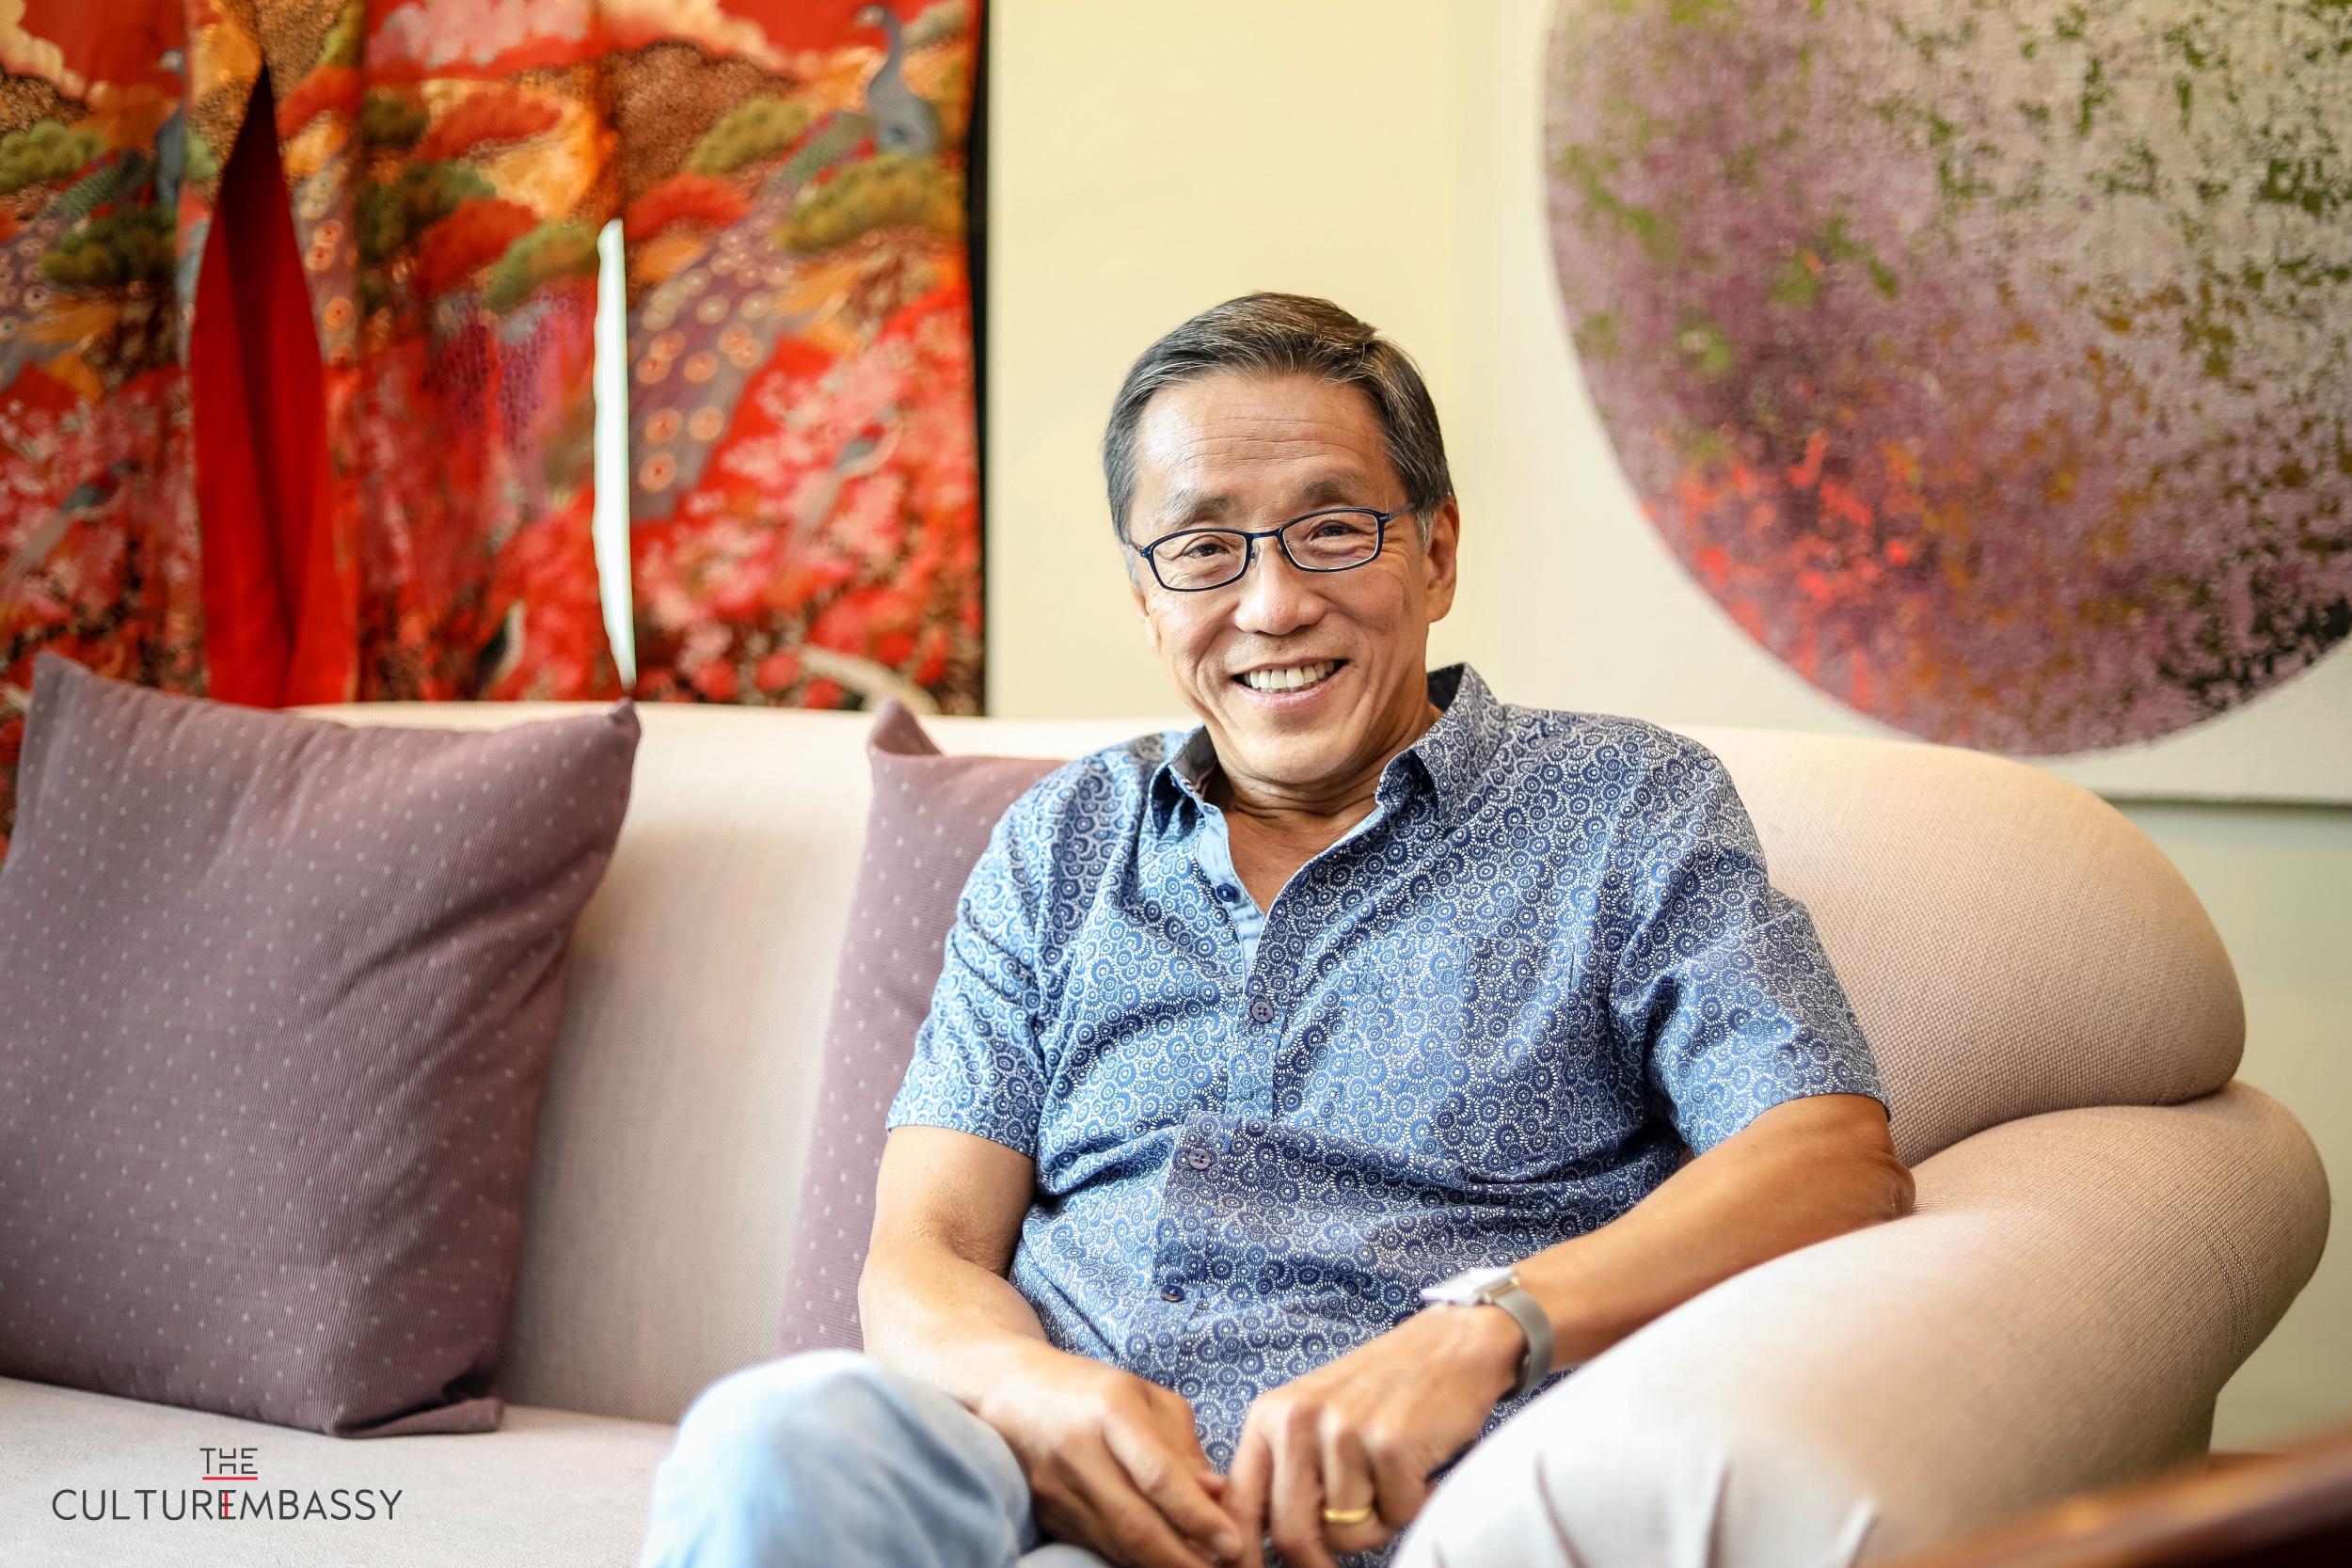 Executive Chairman of Banyan Tree Holdings: Mr Ho Kwon Ping